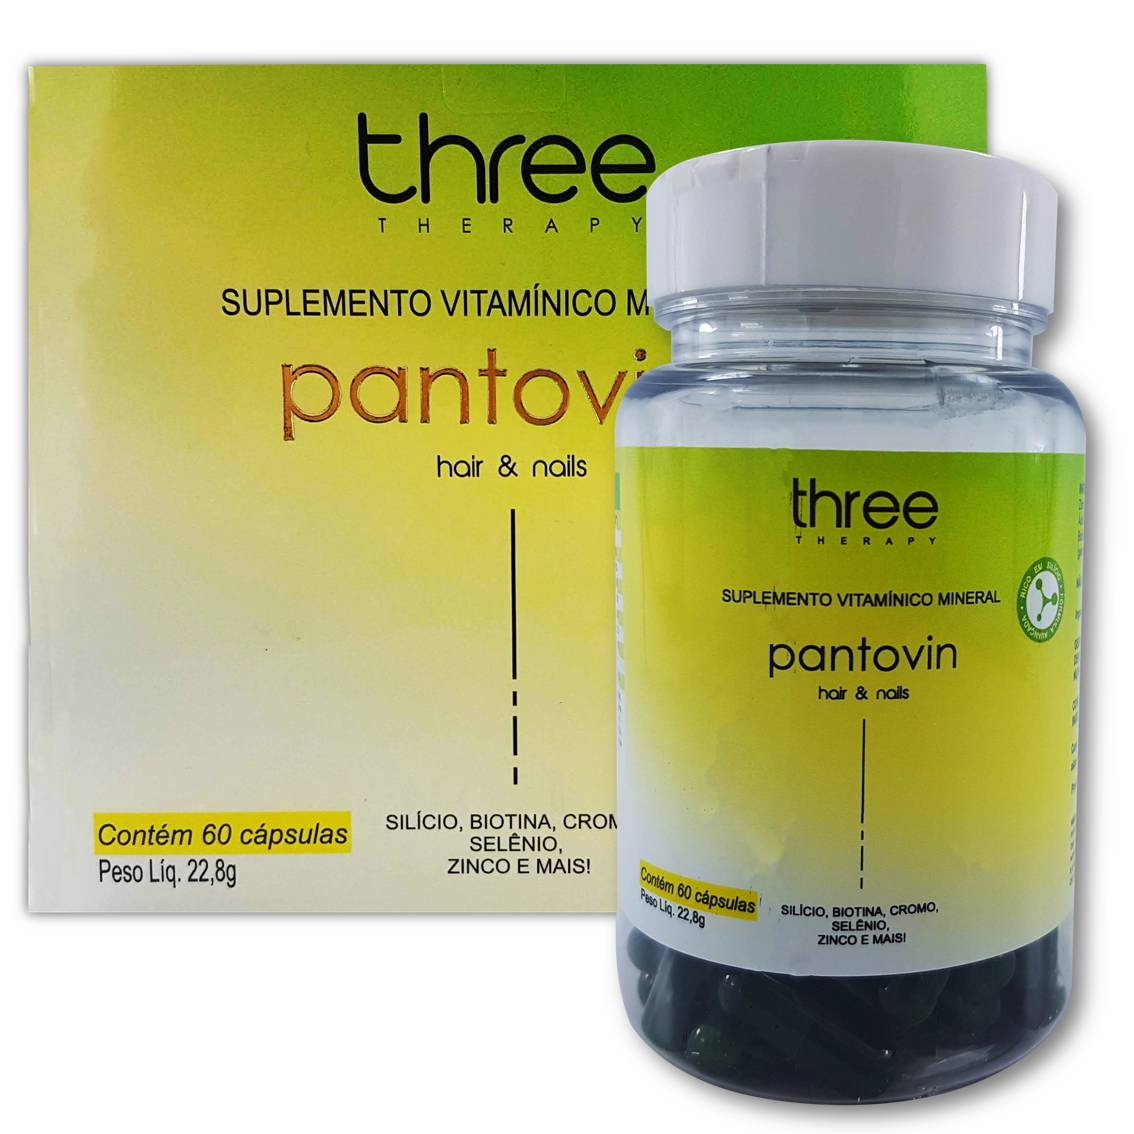 Suplemento Vitamínico Pantovin 60 capsulas – Crescimento de cabelos e unhas